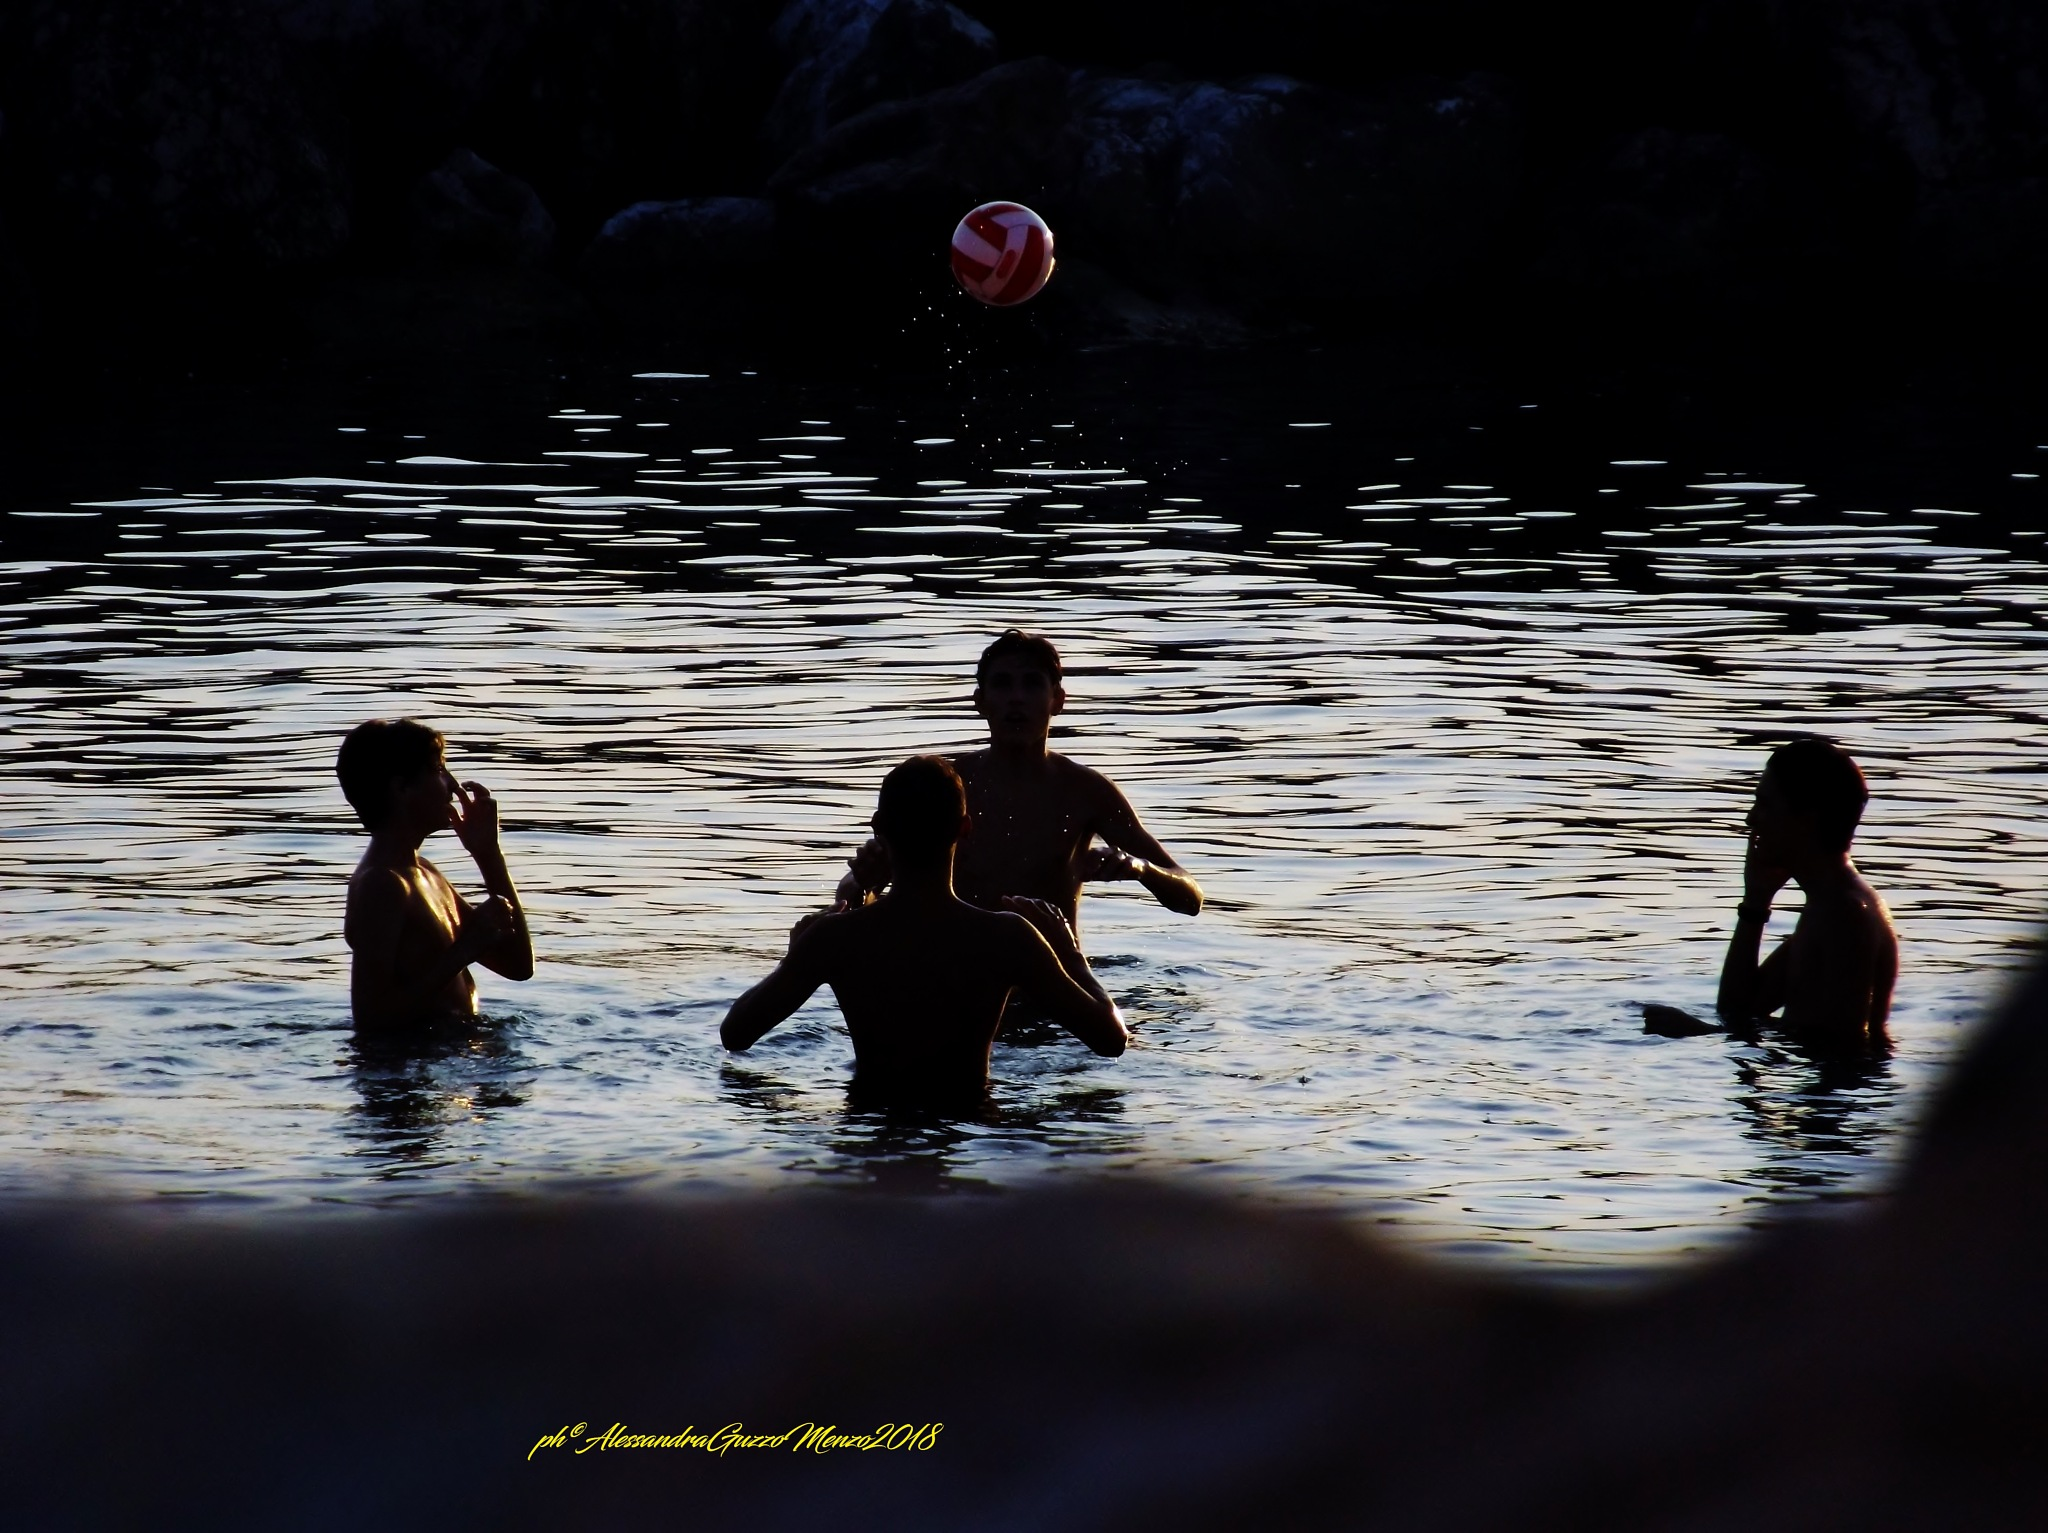 watergames by Alessandra Guzzo Menzo